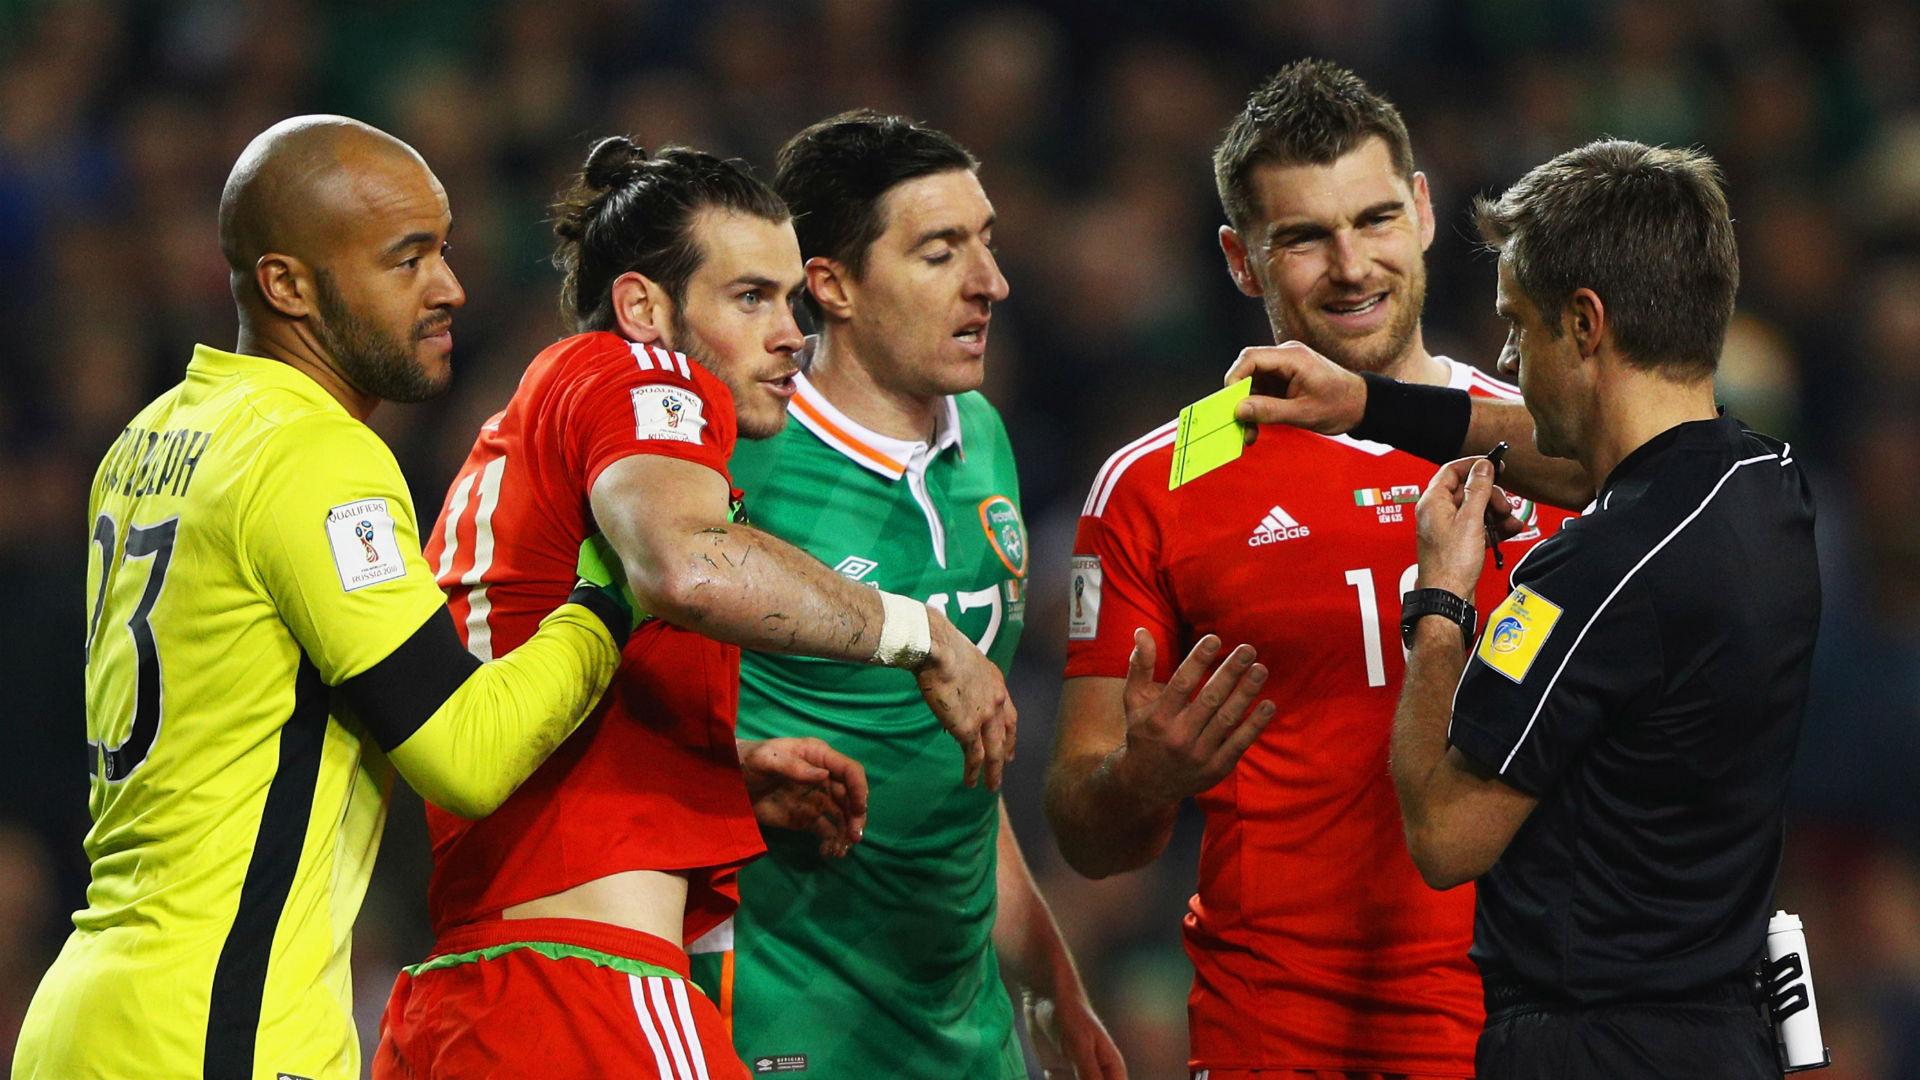 Darren Randolph John O'Shea Gareth Bale Republic of Ireland Wales 24032017